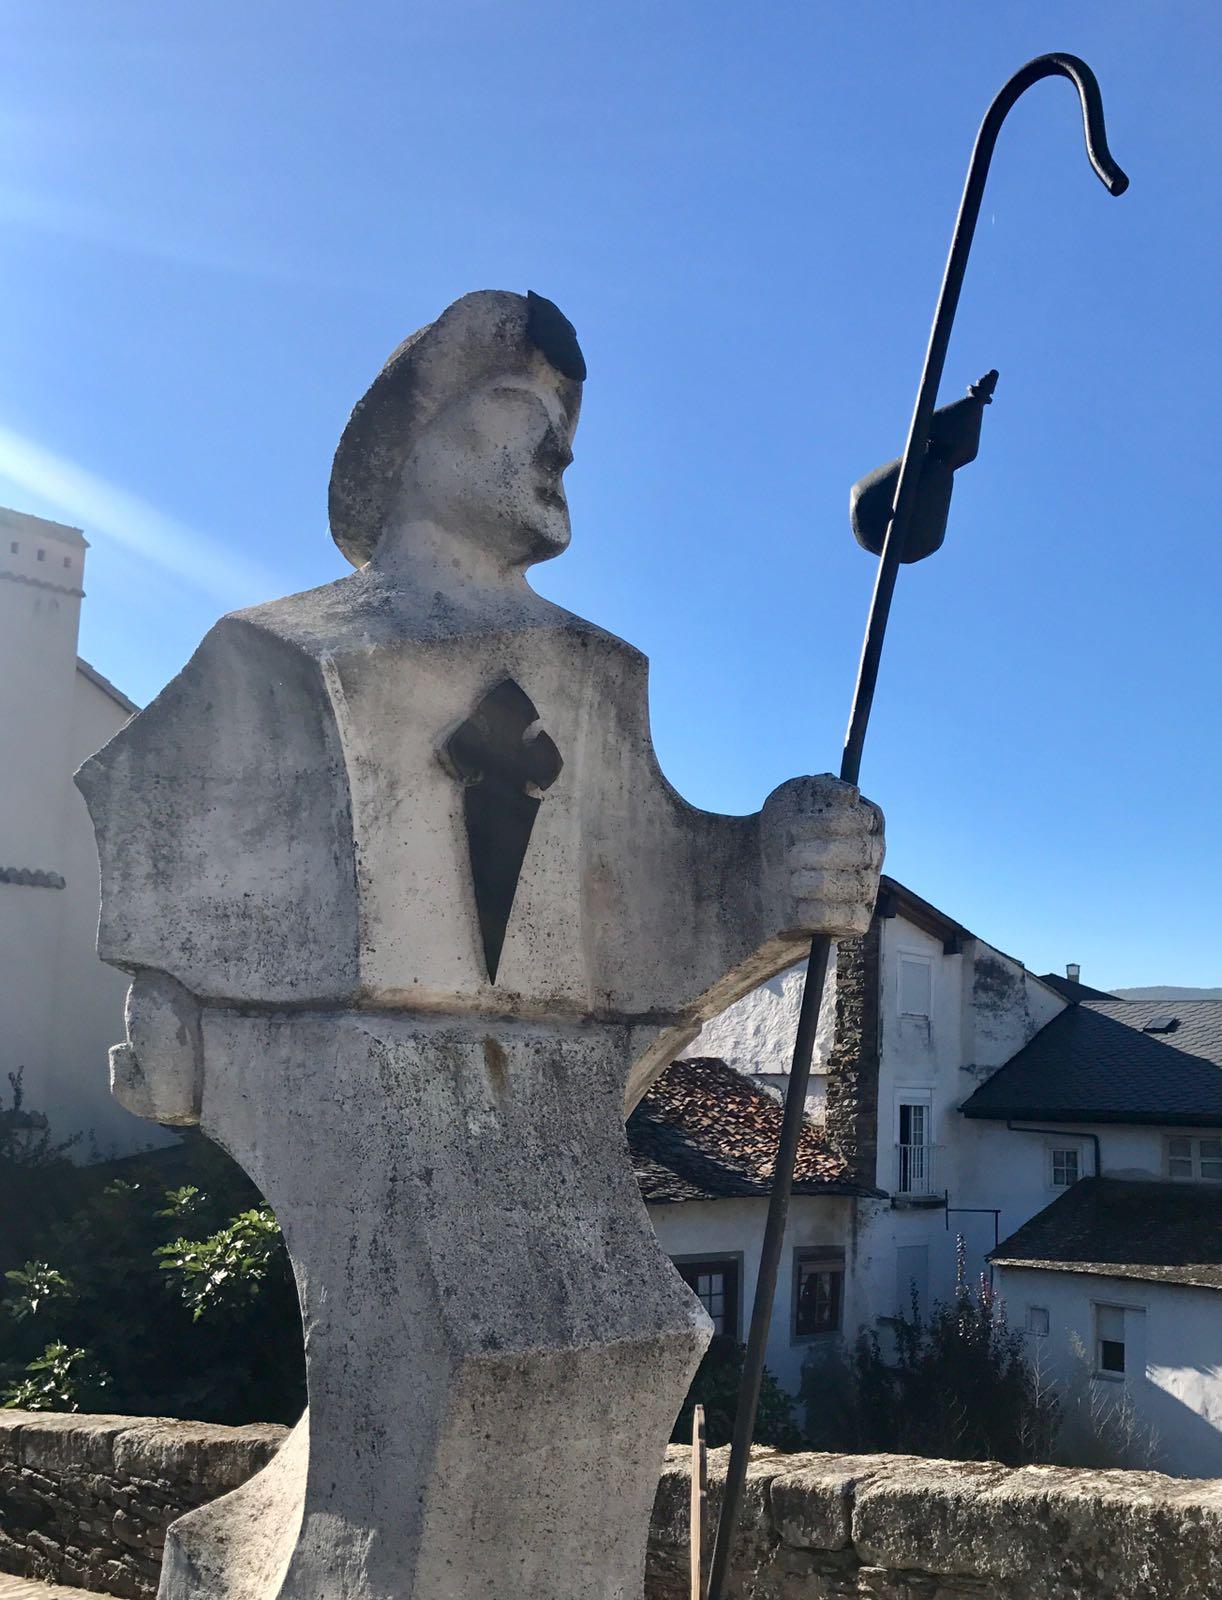 Pilgrim statue in Villafranca del bierzo